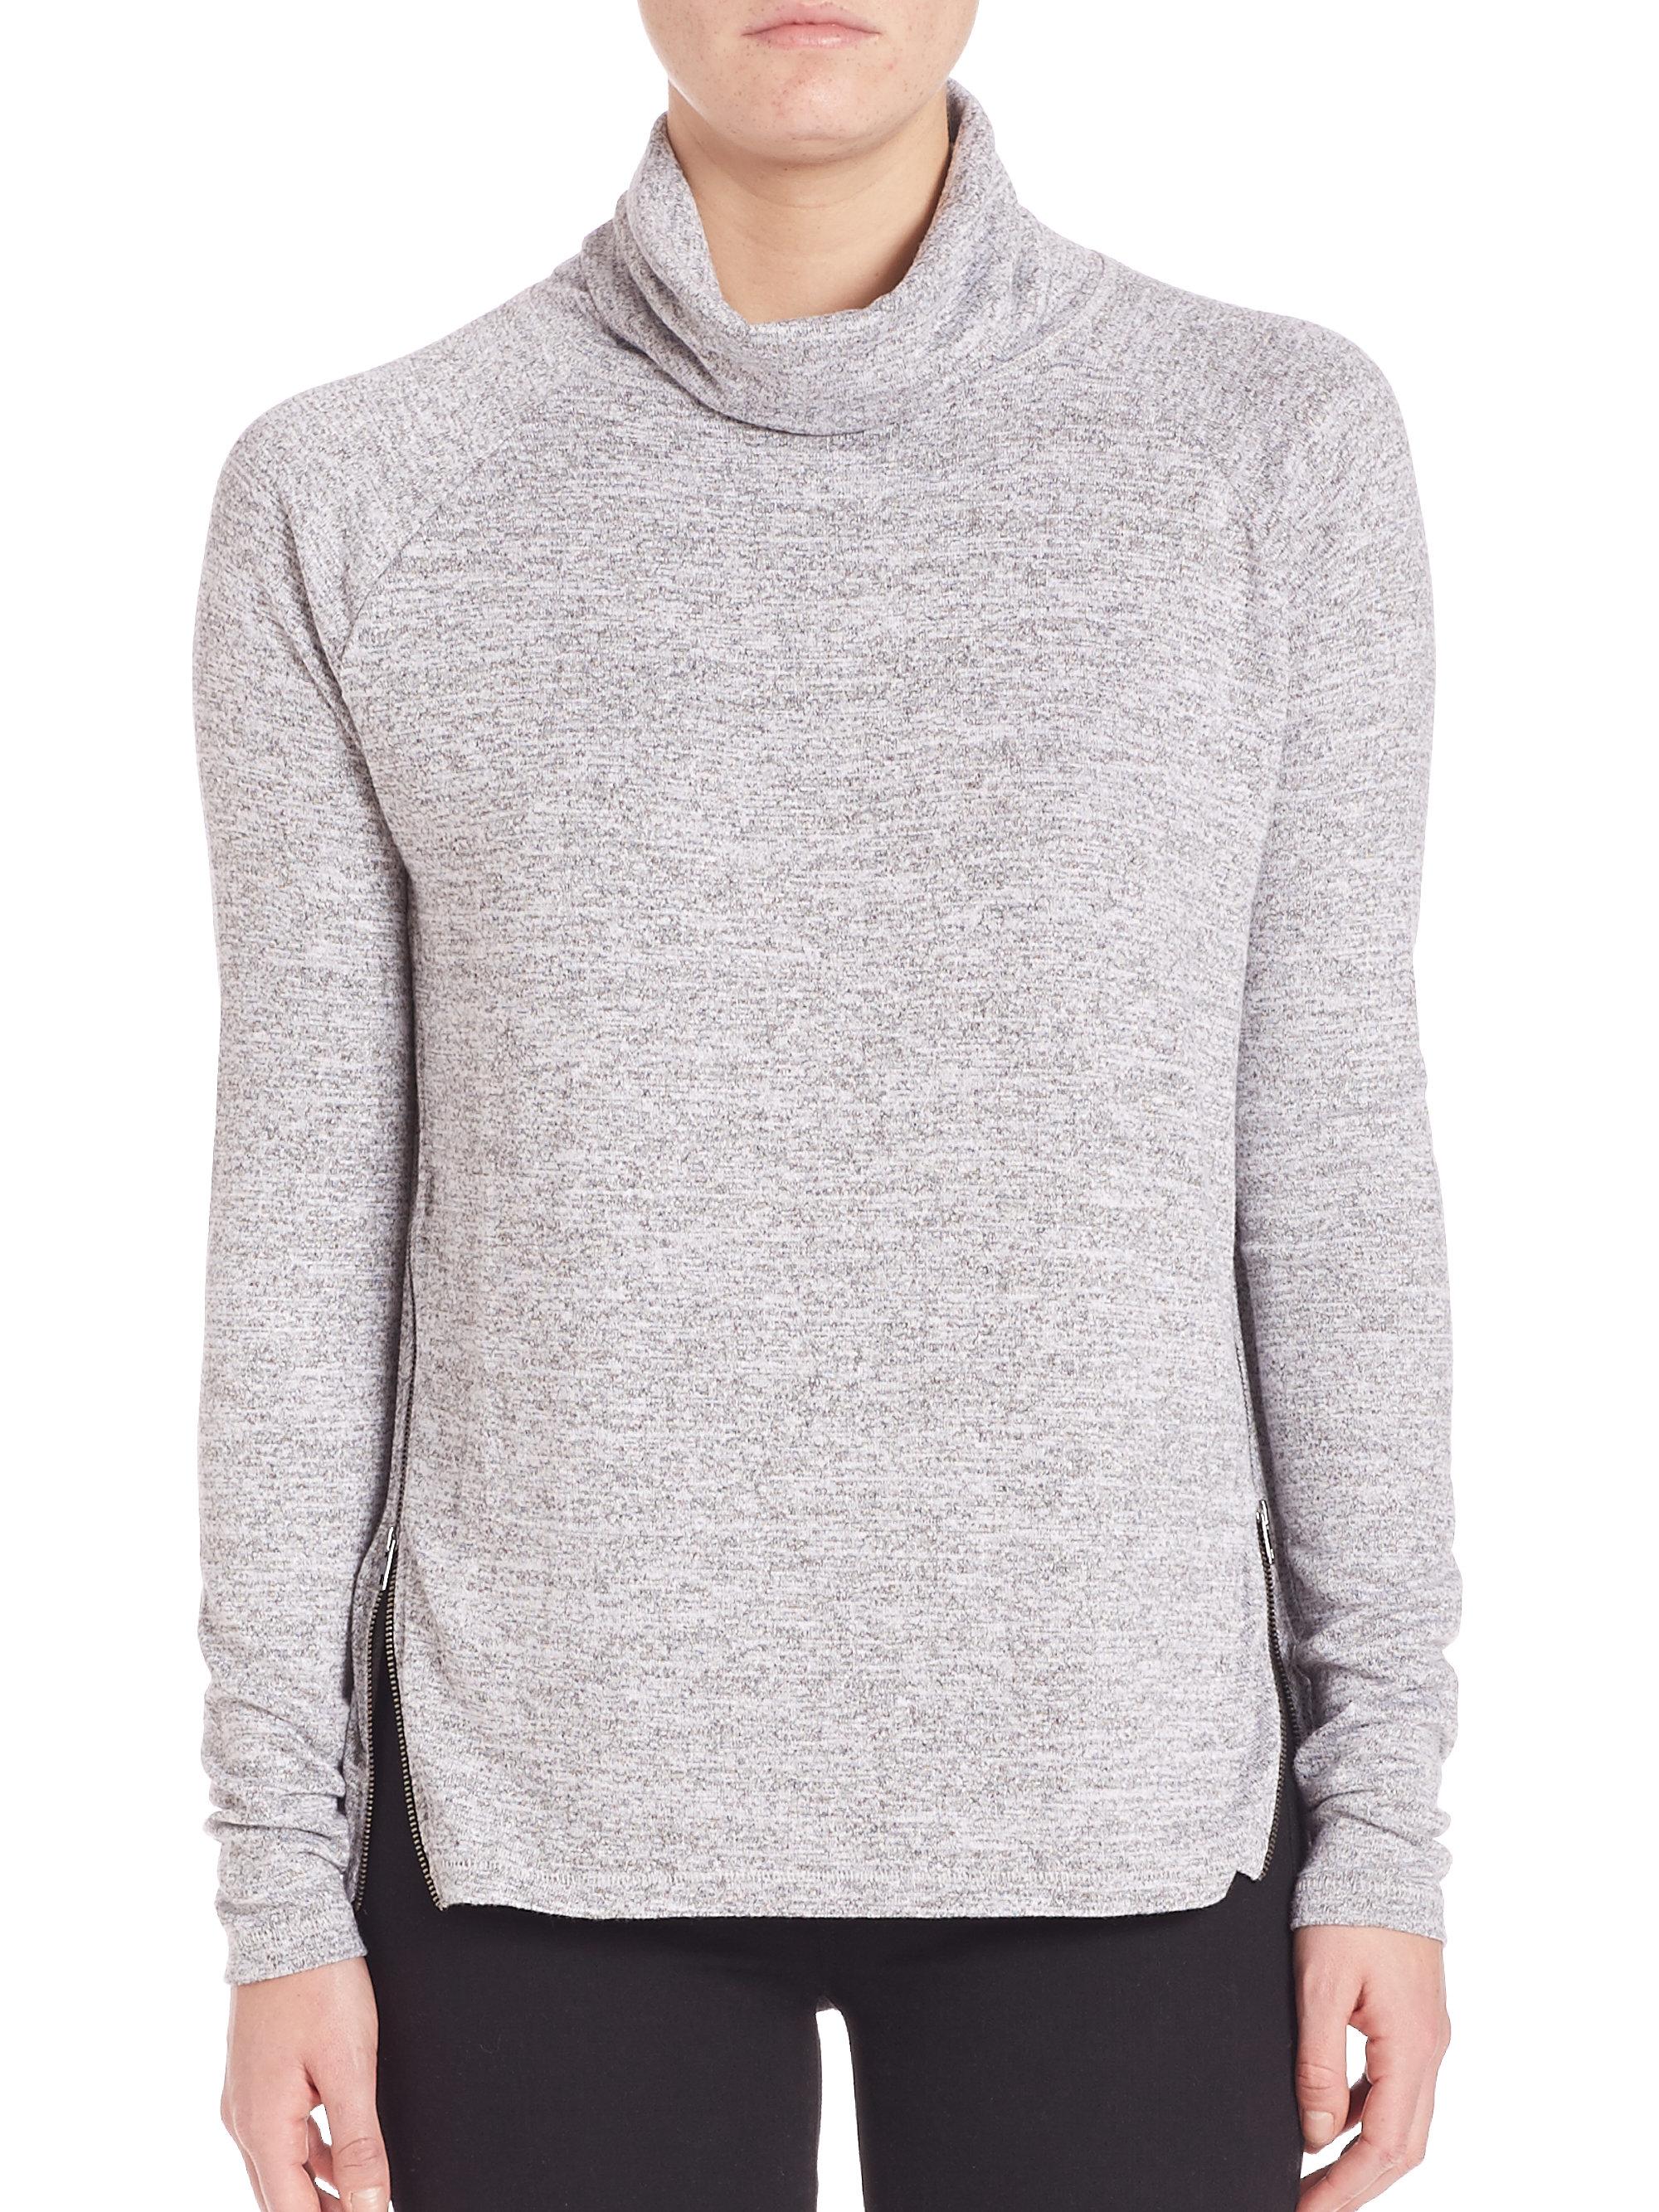 7d3054e8e rag-bonejean-heather-grey-camden-turtleneck-sweater-gray-product-0-601343361-normal.jpeg